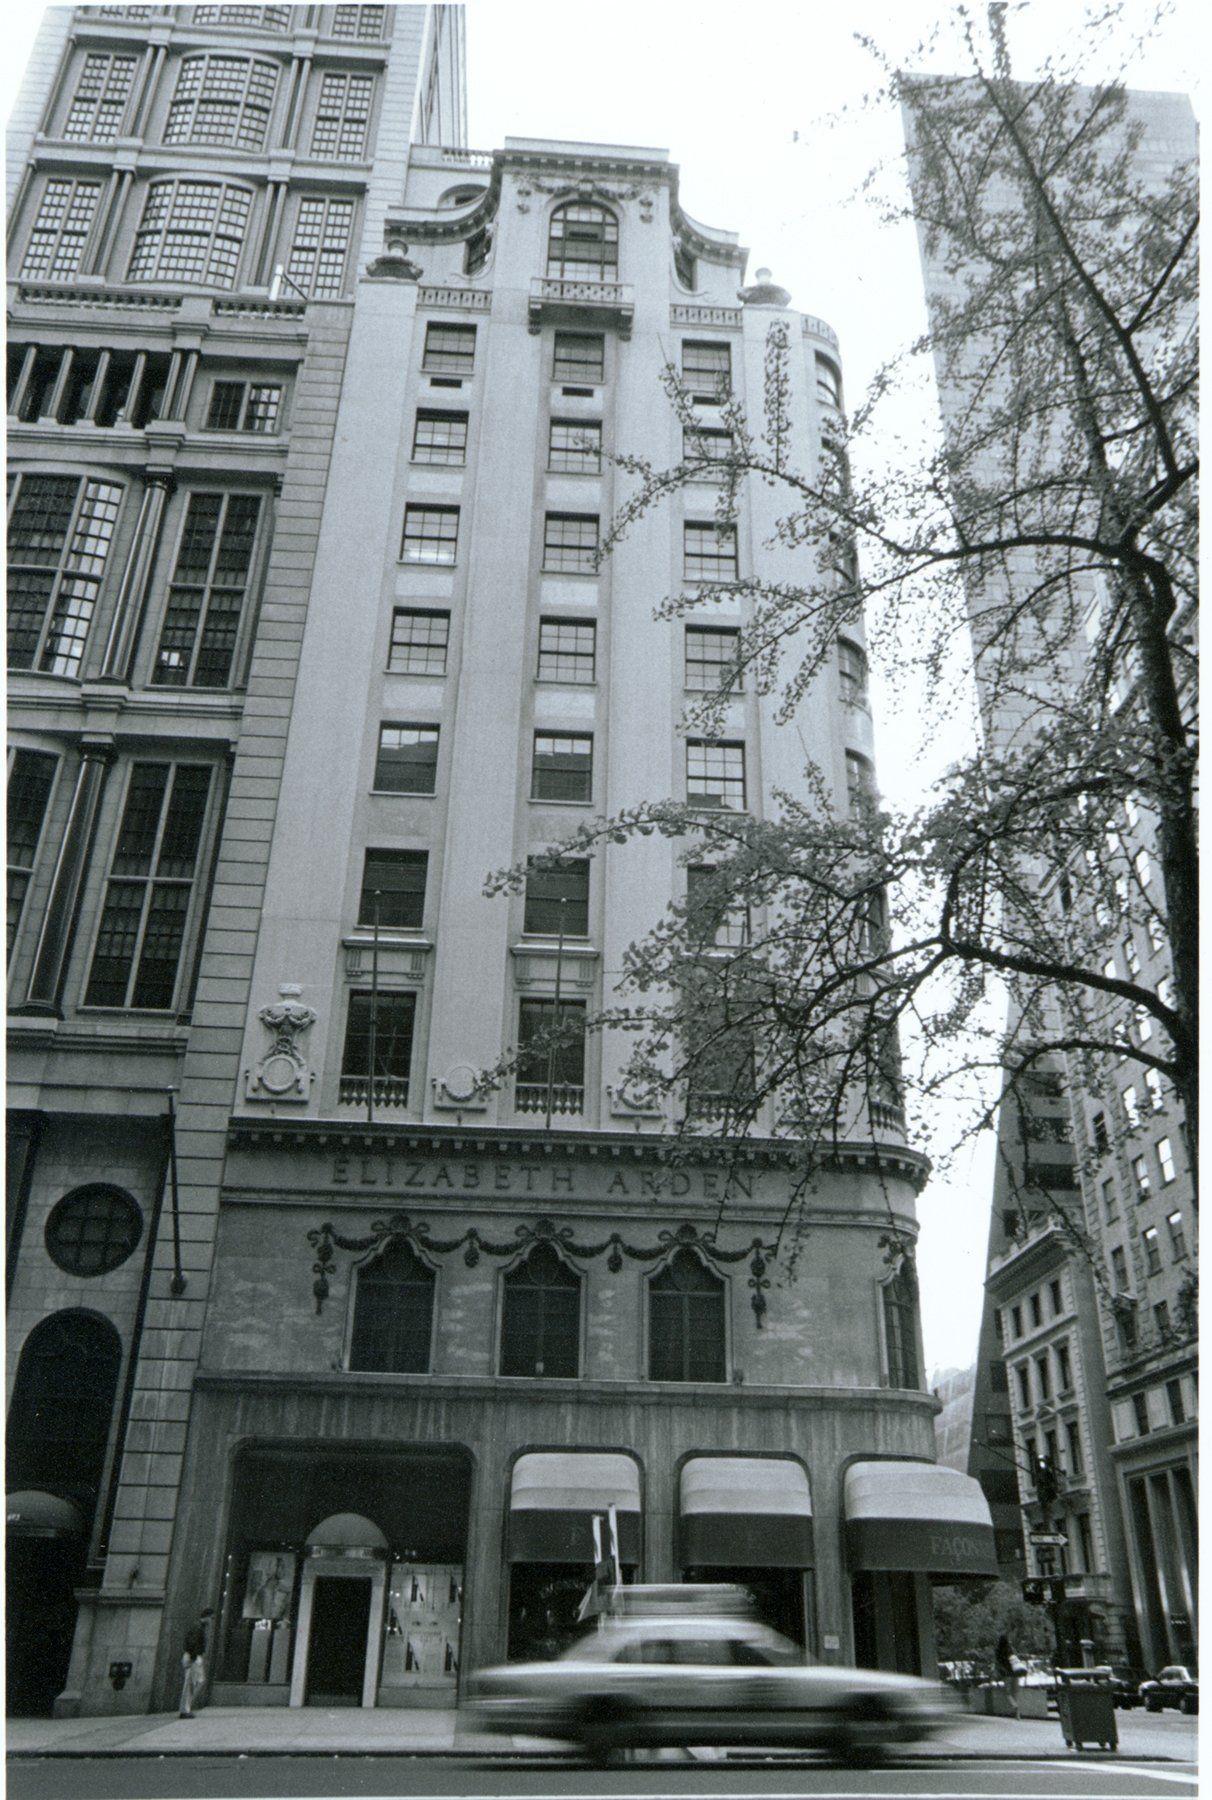 Elizabeth Ardens Famous Red Door Spa 5th Avenue New York